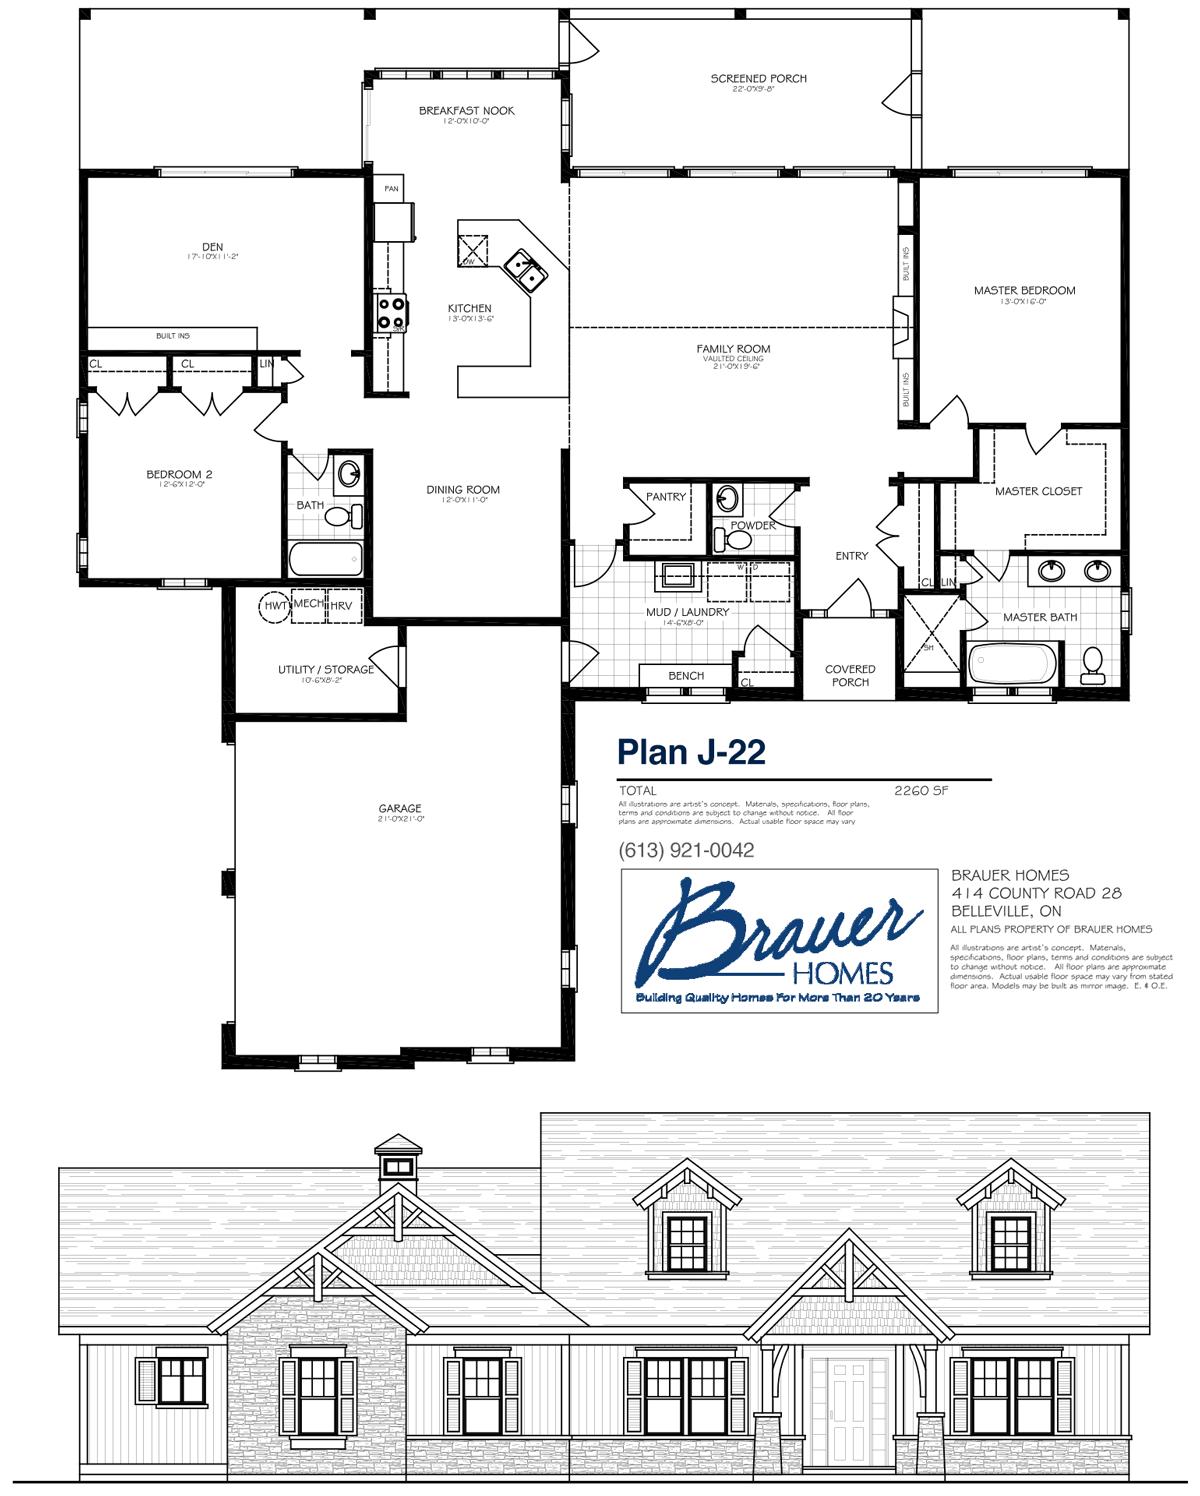 Brauer Build Plan J-22